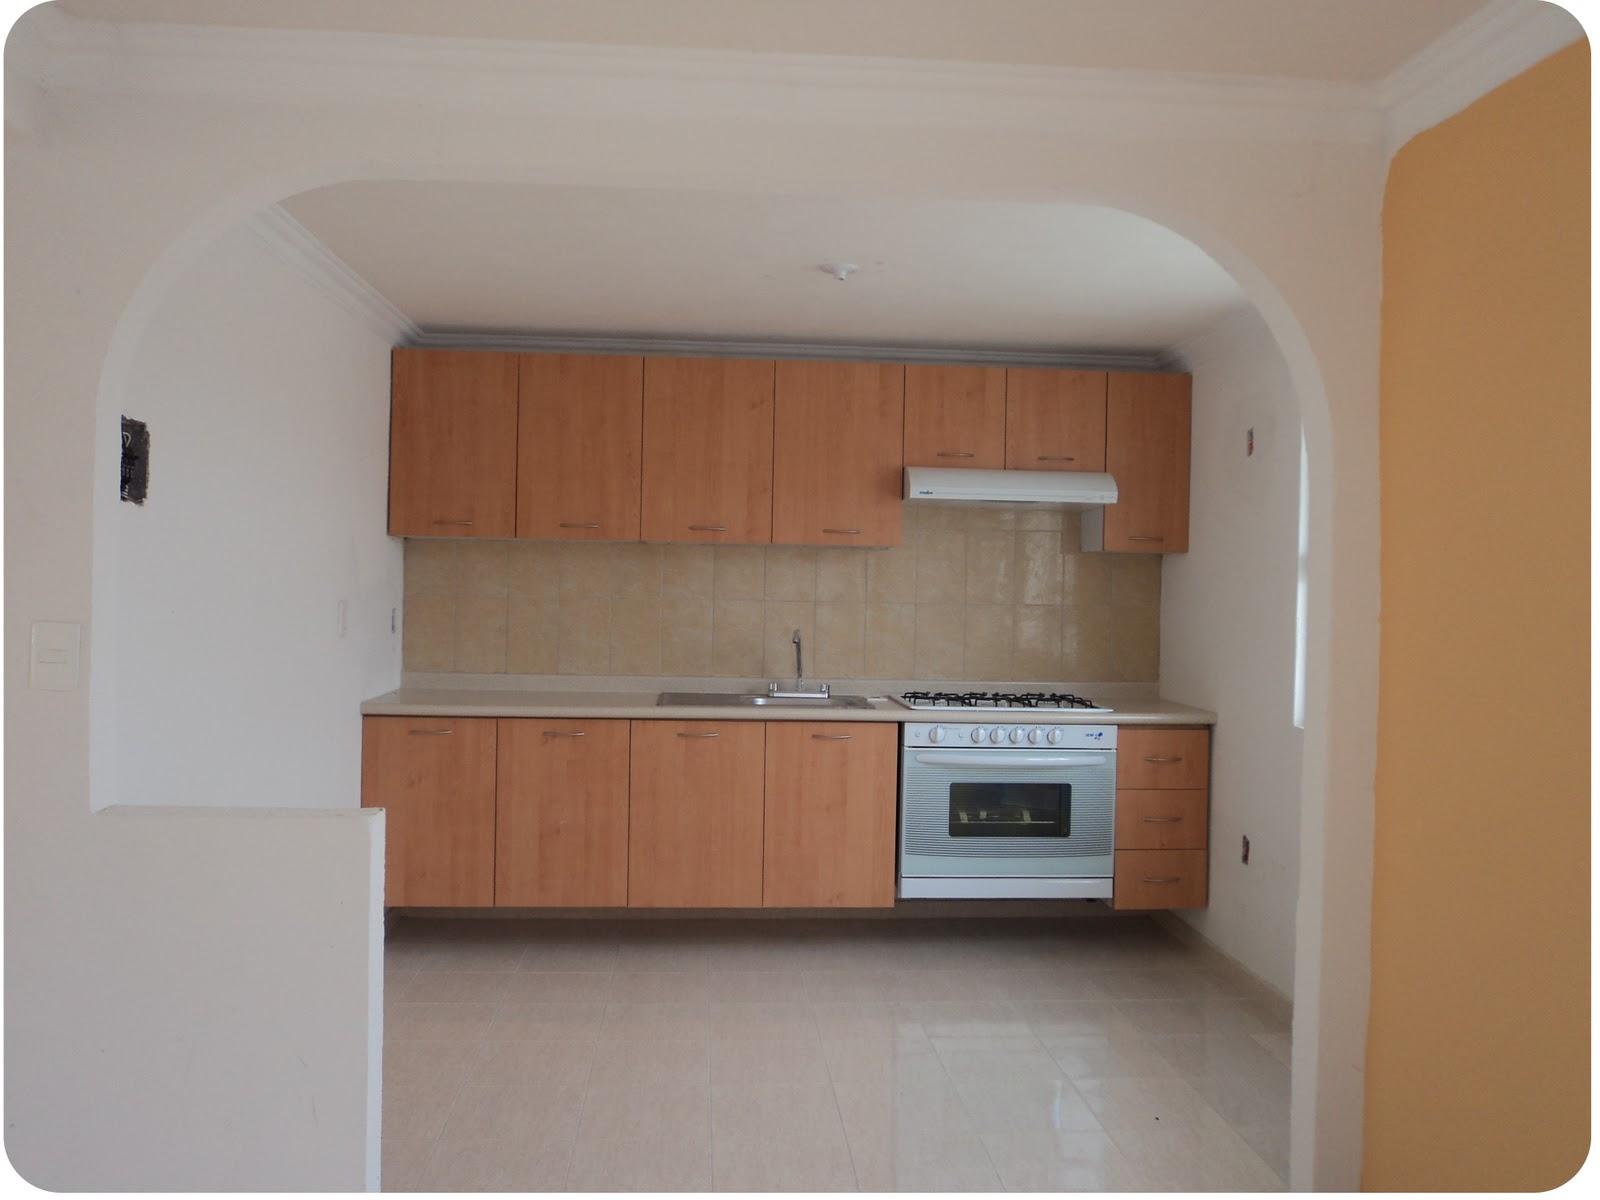 Casas en tizayuca fracc privado don carlos modelo rub for Cocinas de concreto forradas de azulejo